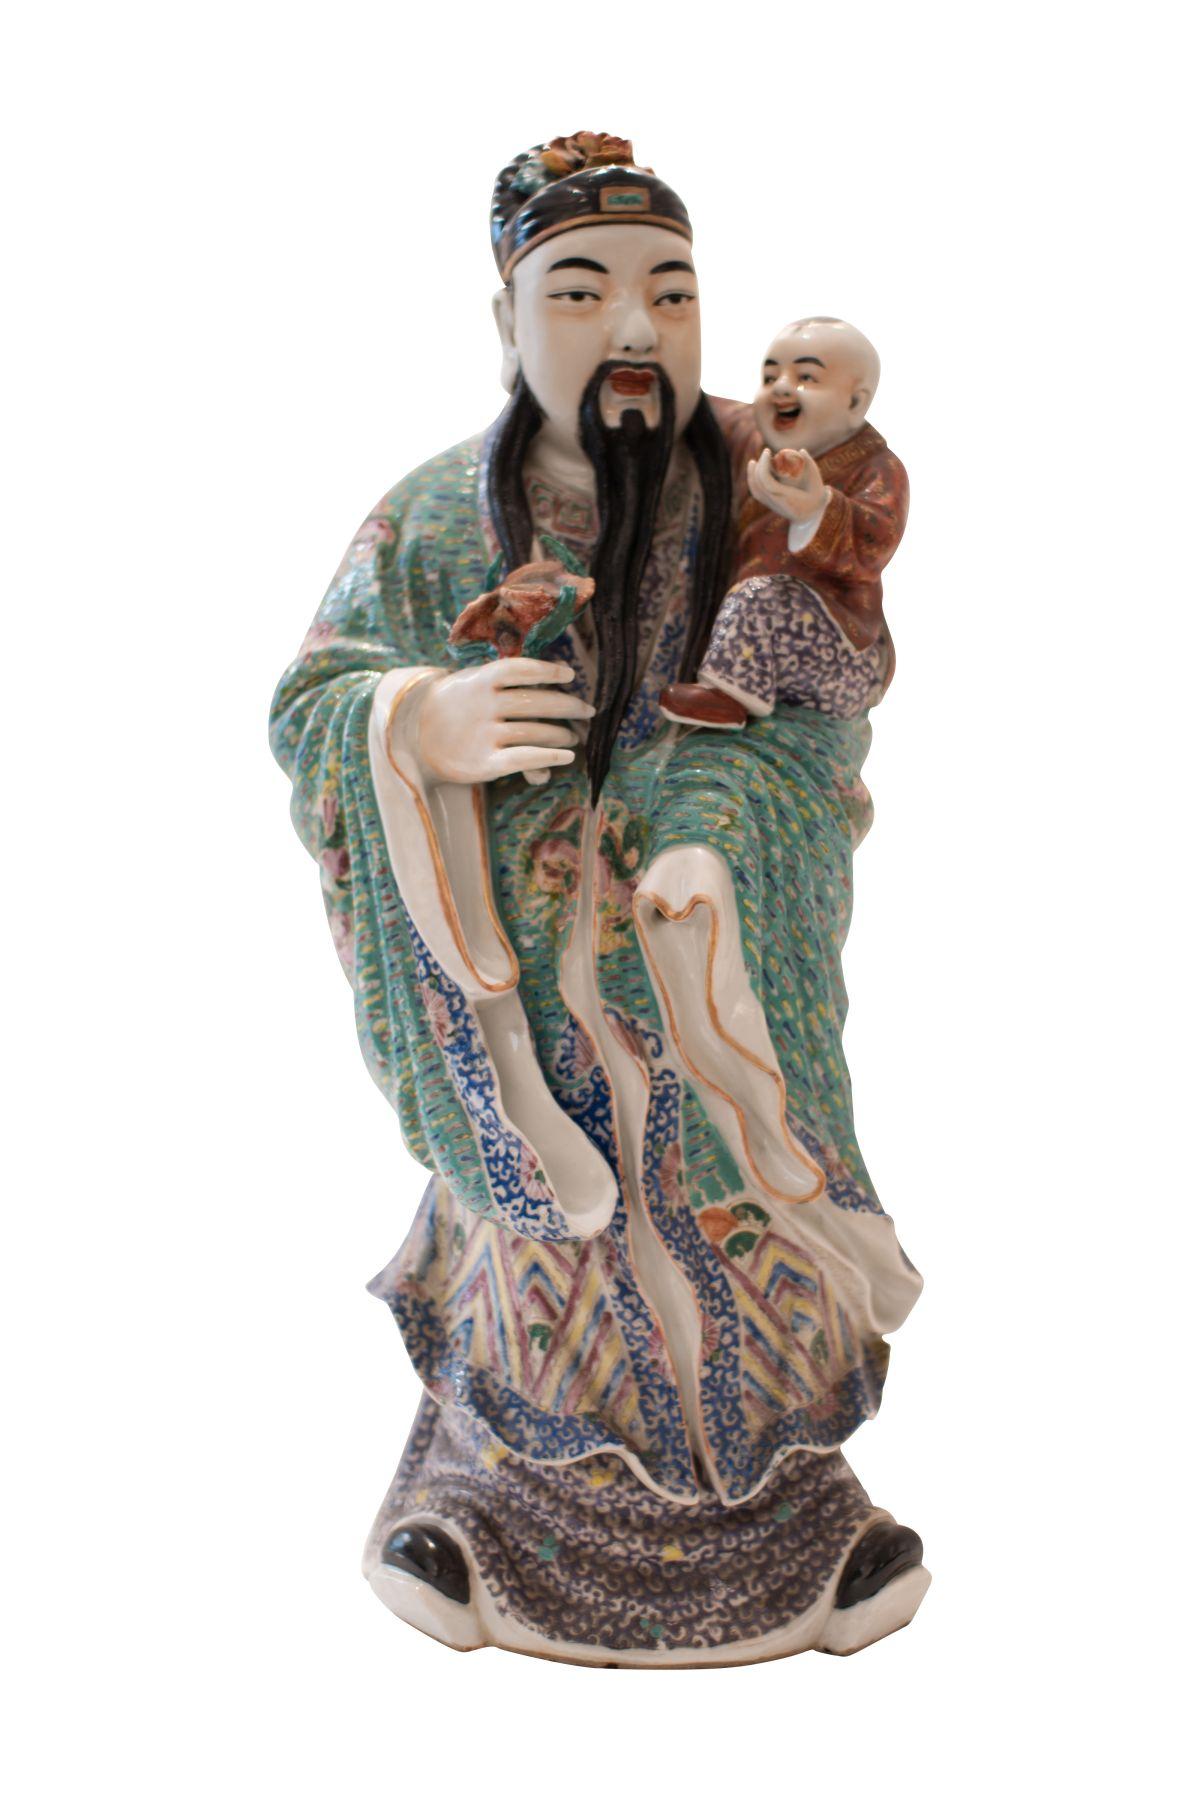 #73 Asian priest with child | Asiatischer Priester mit Kind Image